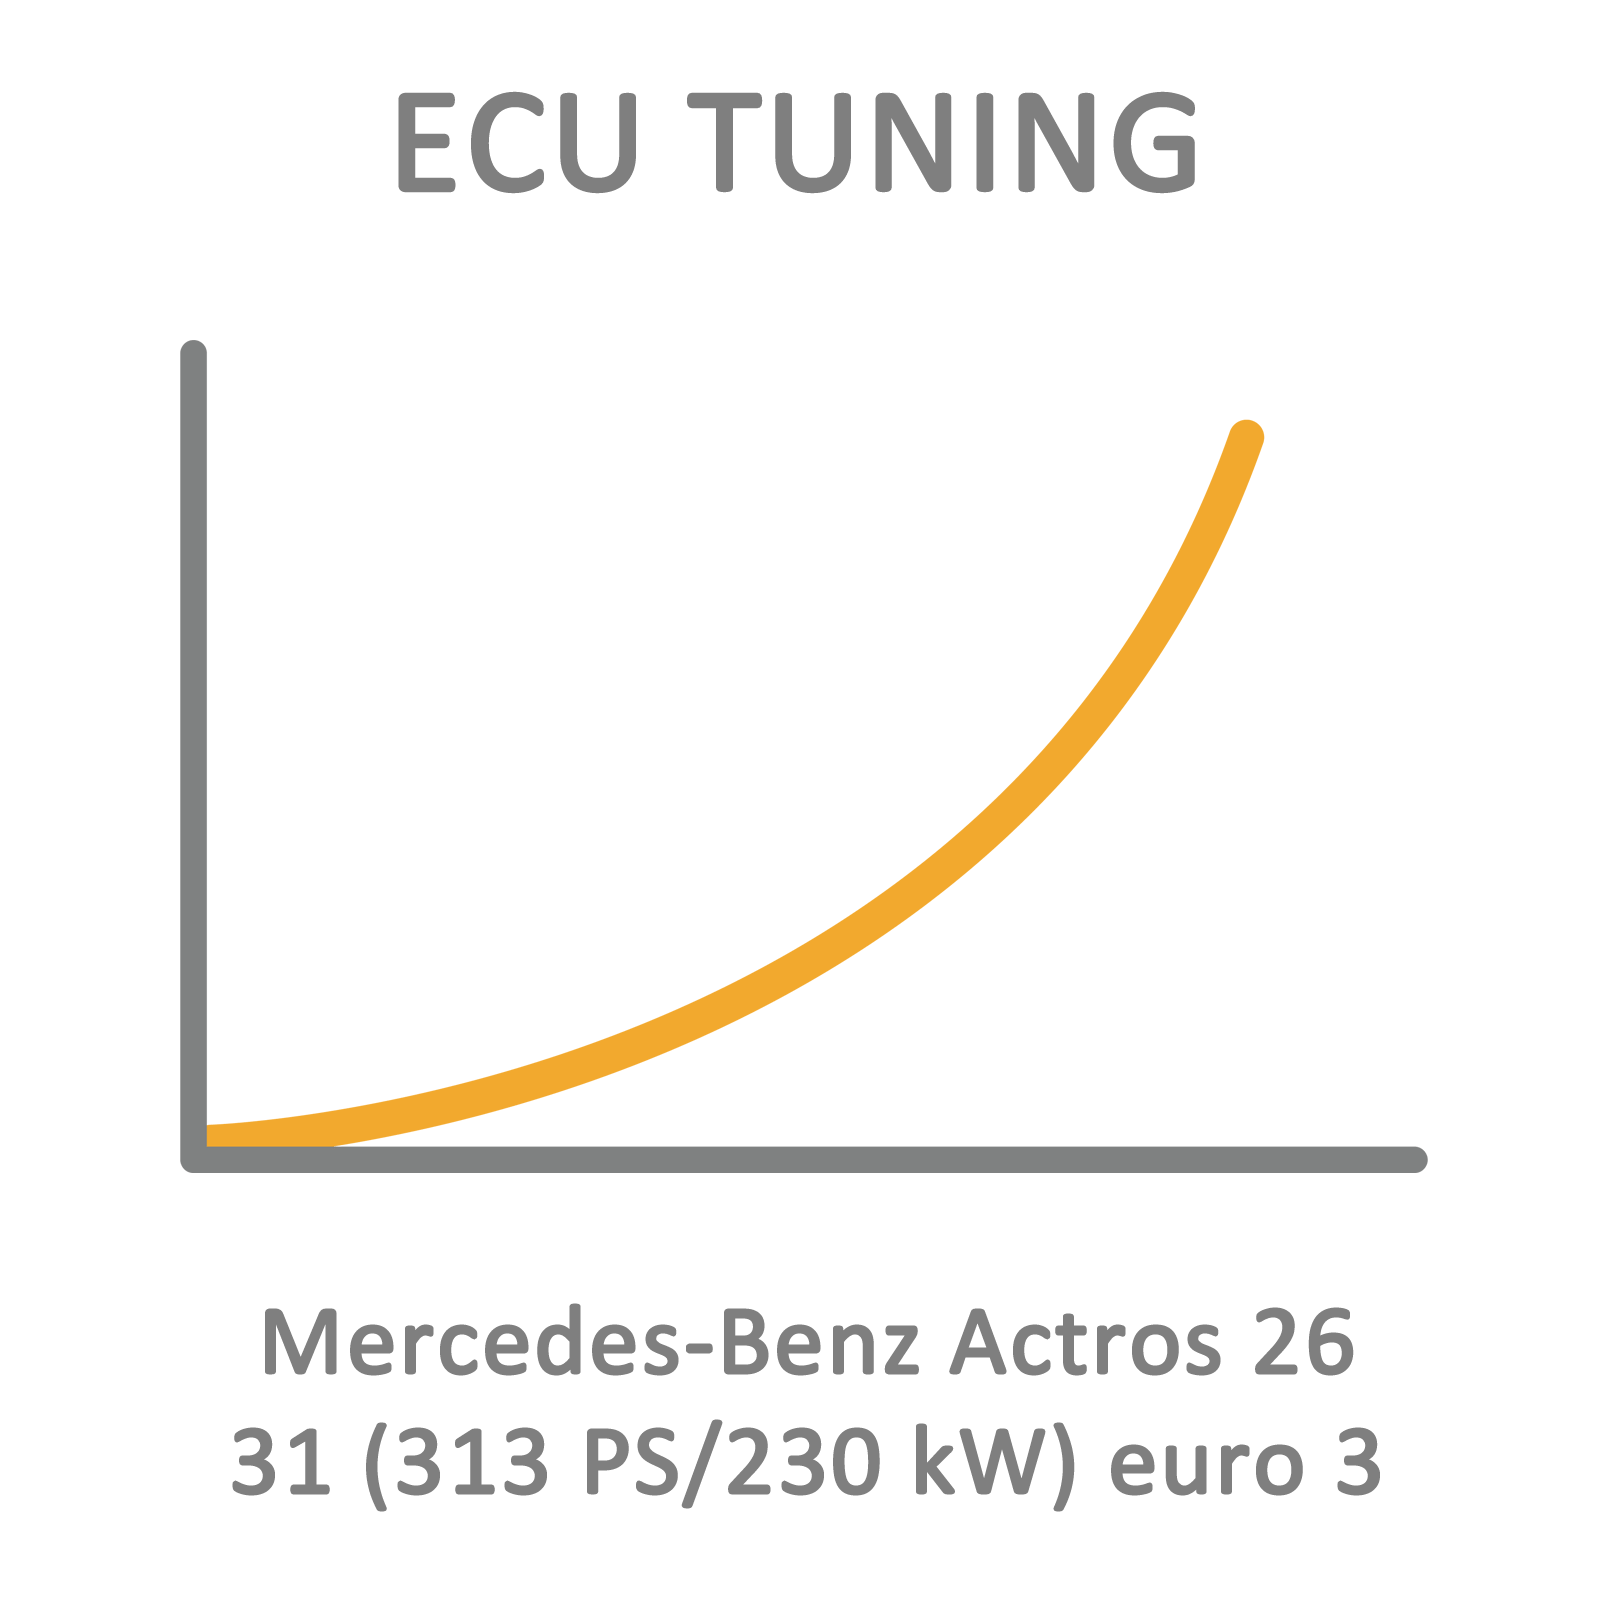 Mercedes-Benz Actros 26 31 (313 PS/230 kW) euro 3 ECU